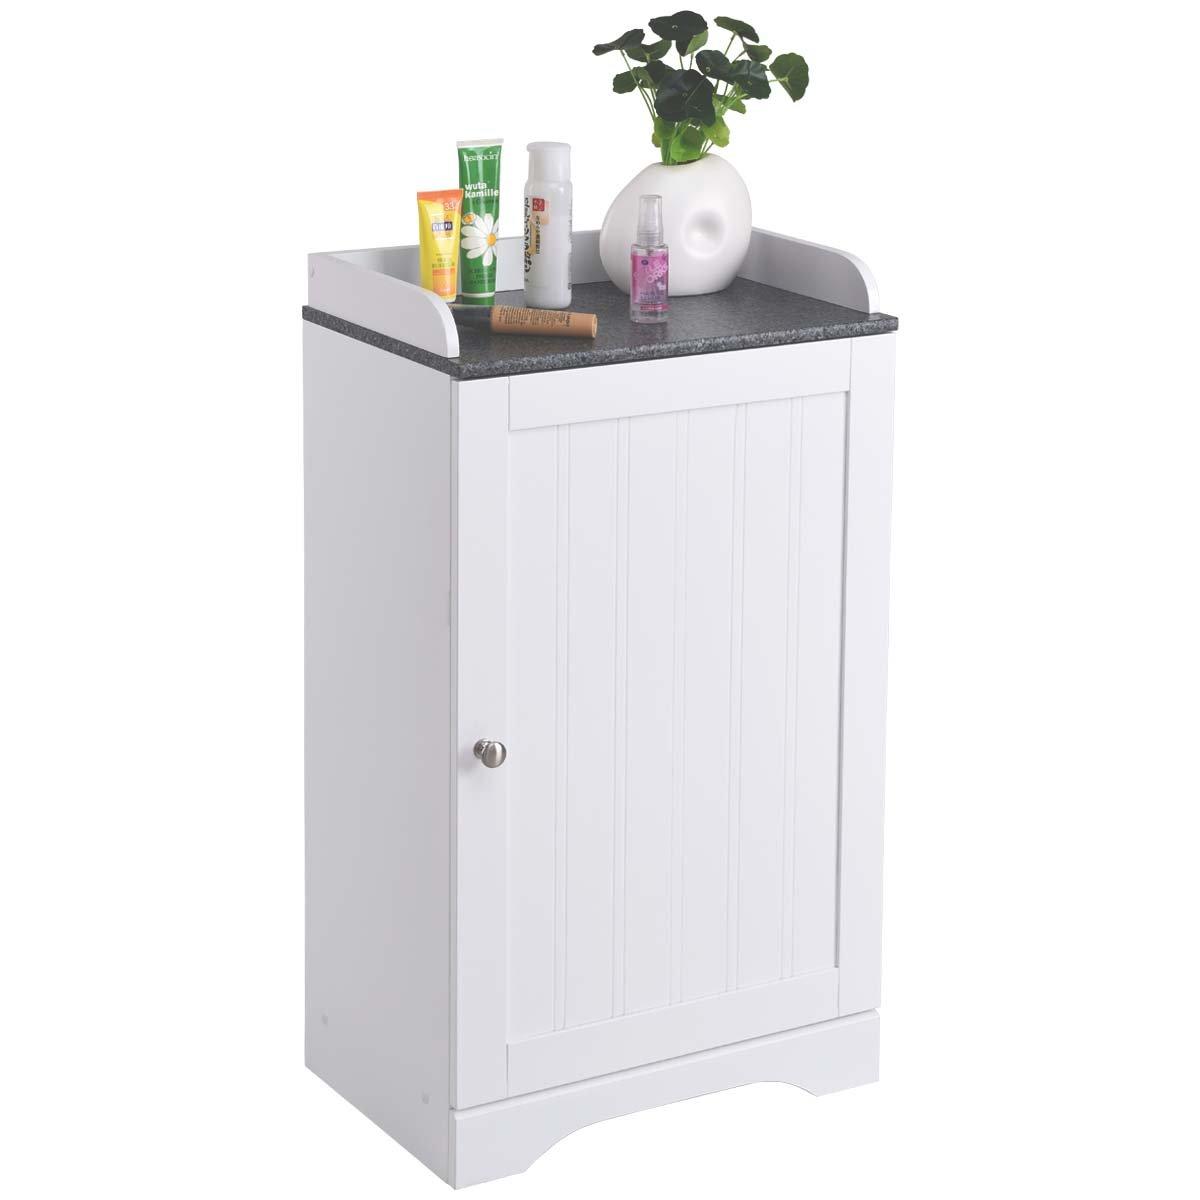 Tangkula Bathroom Floor Storage Cabinet Freestanding Adjustable Shelves Organizer Single Door White Finish